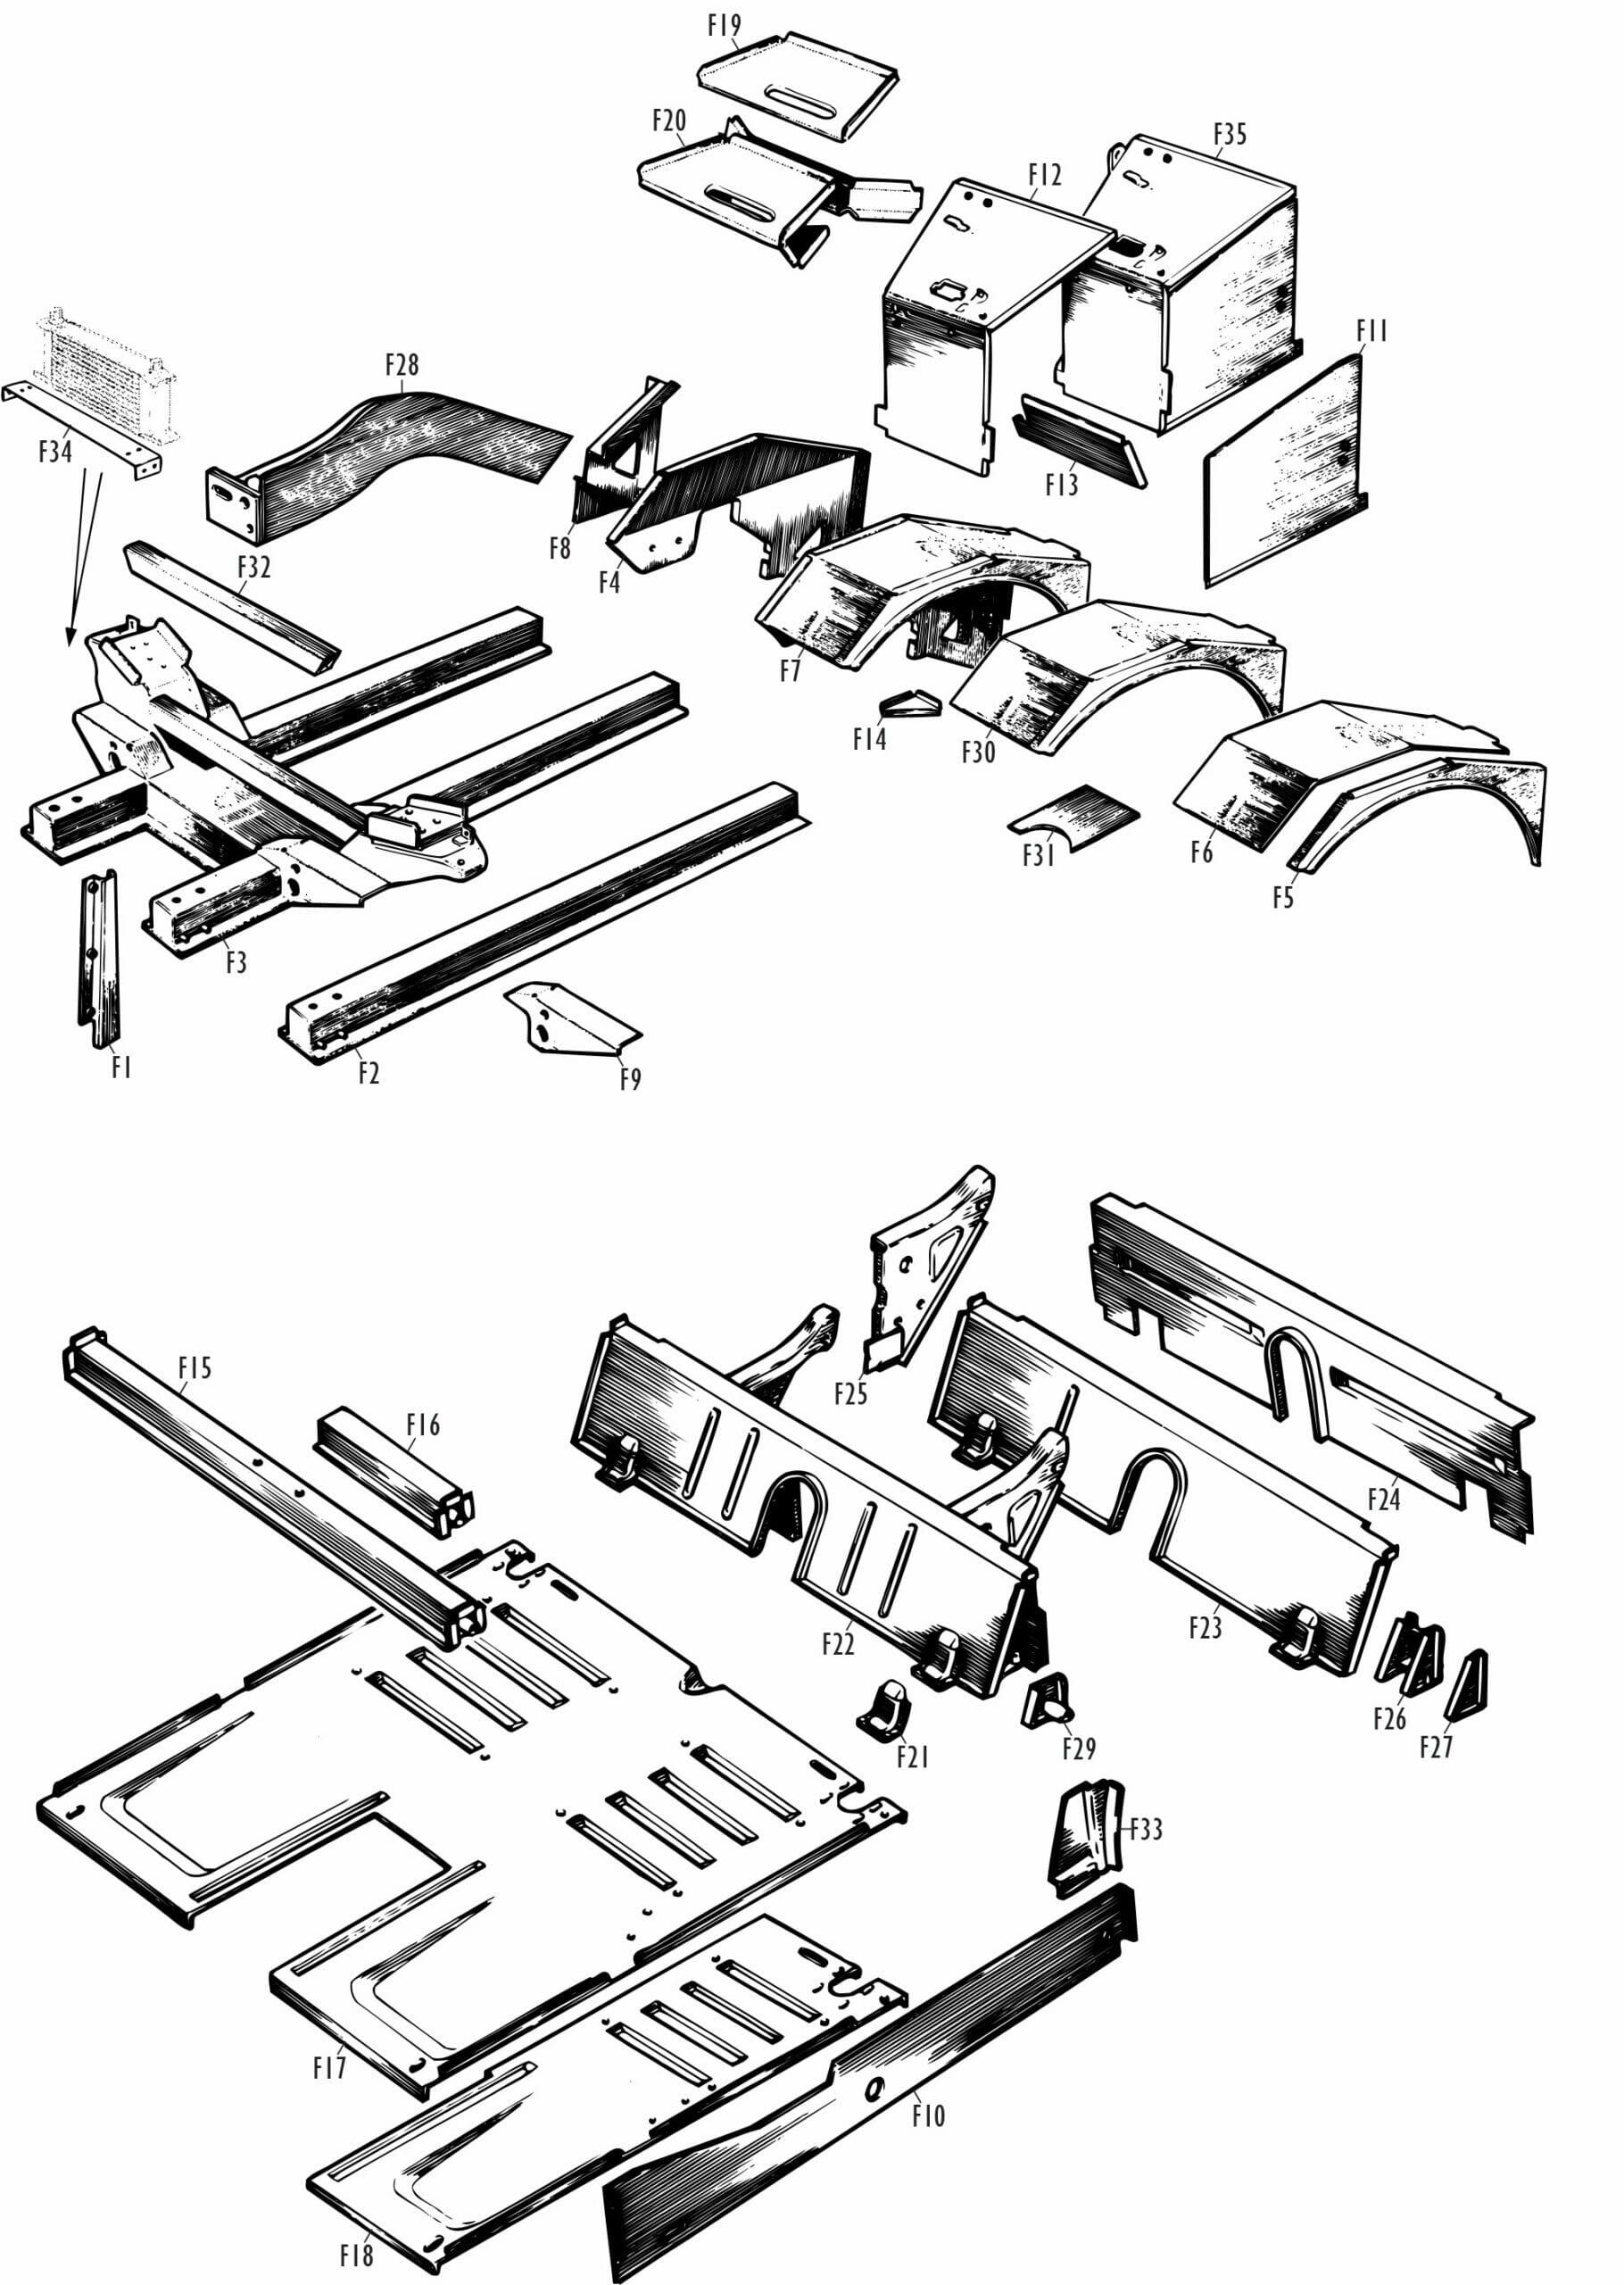 MG Midget Parts - MG Midget Front Centre Body